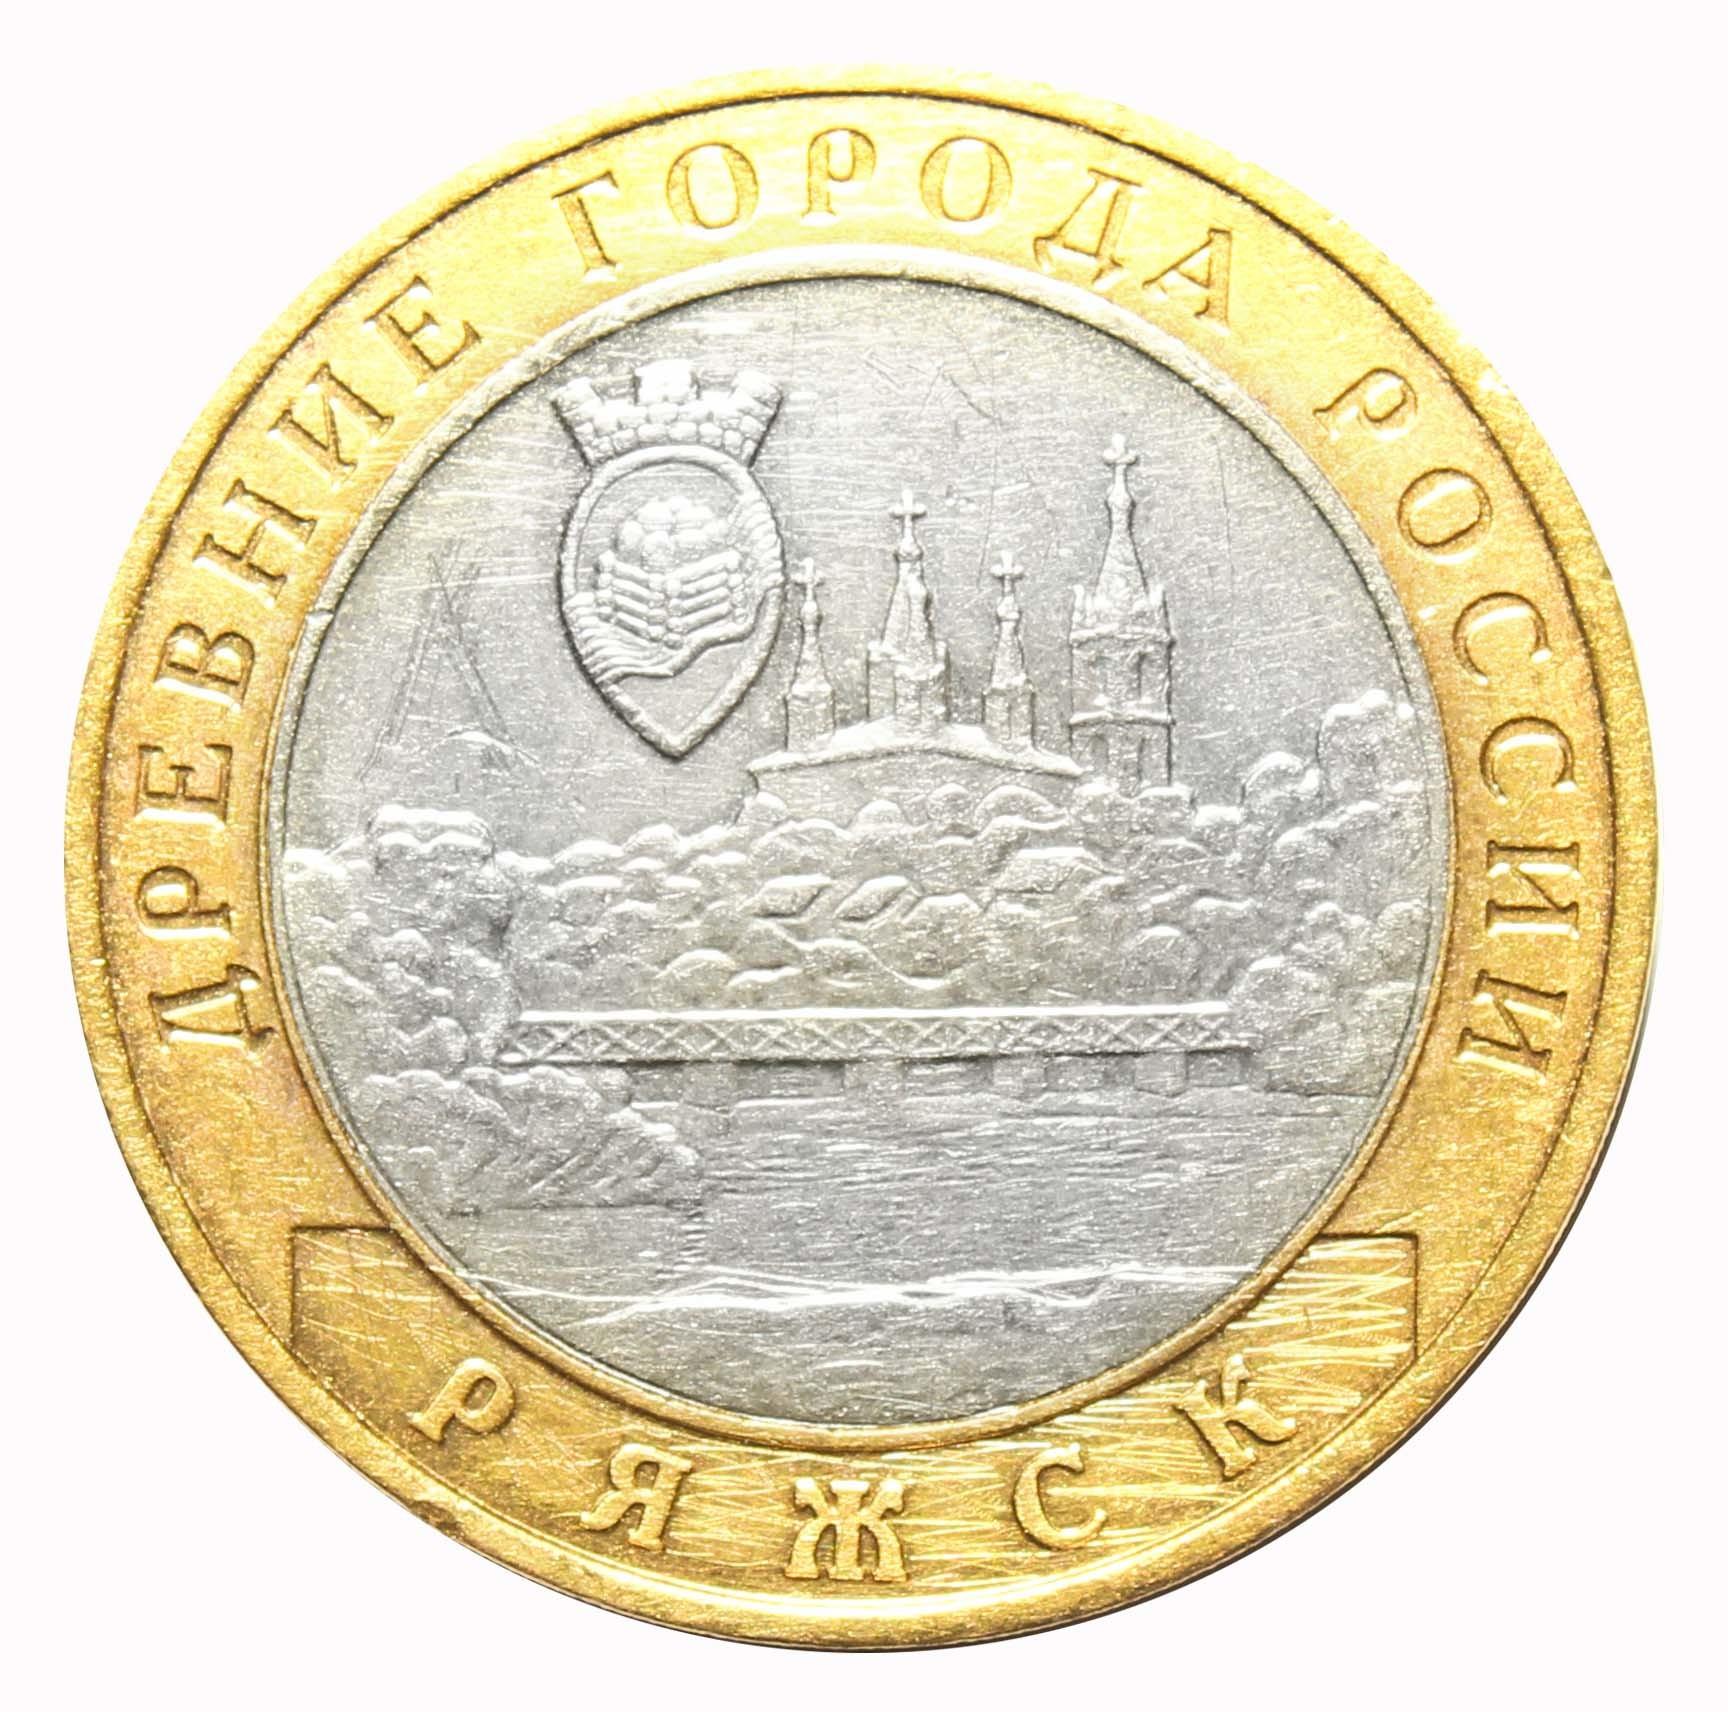 10 рублей Ряжск 2004 г